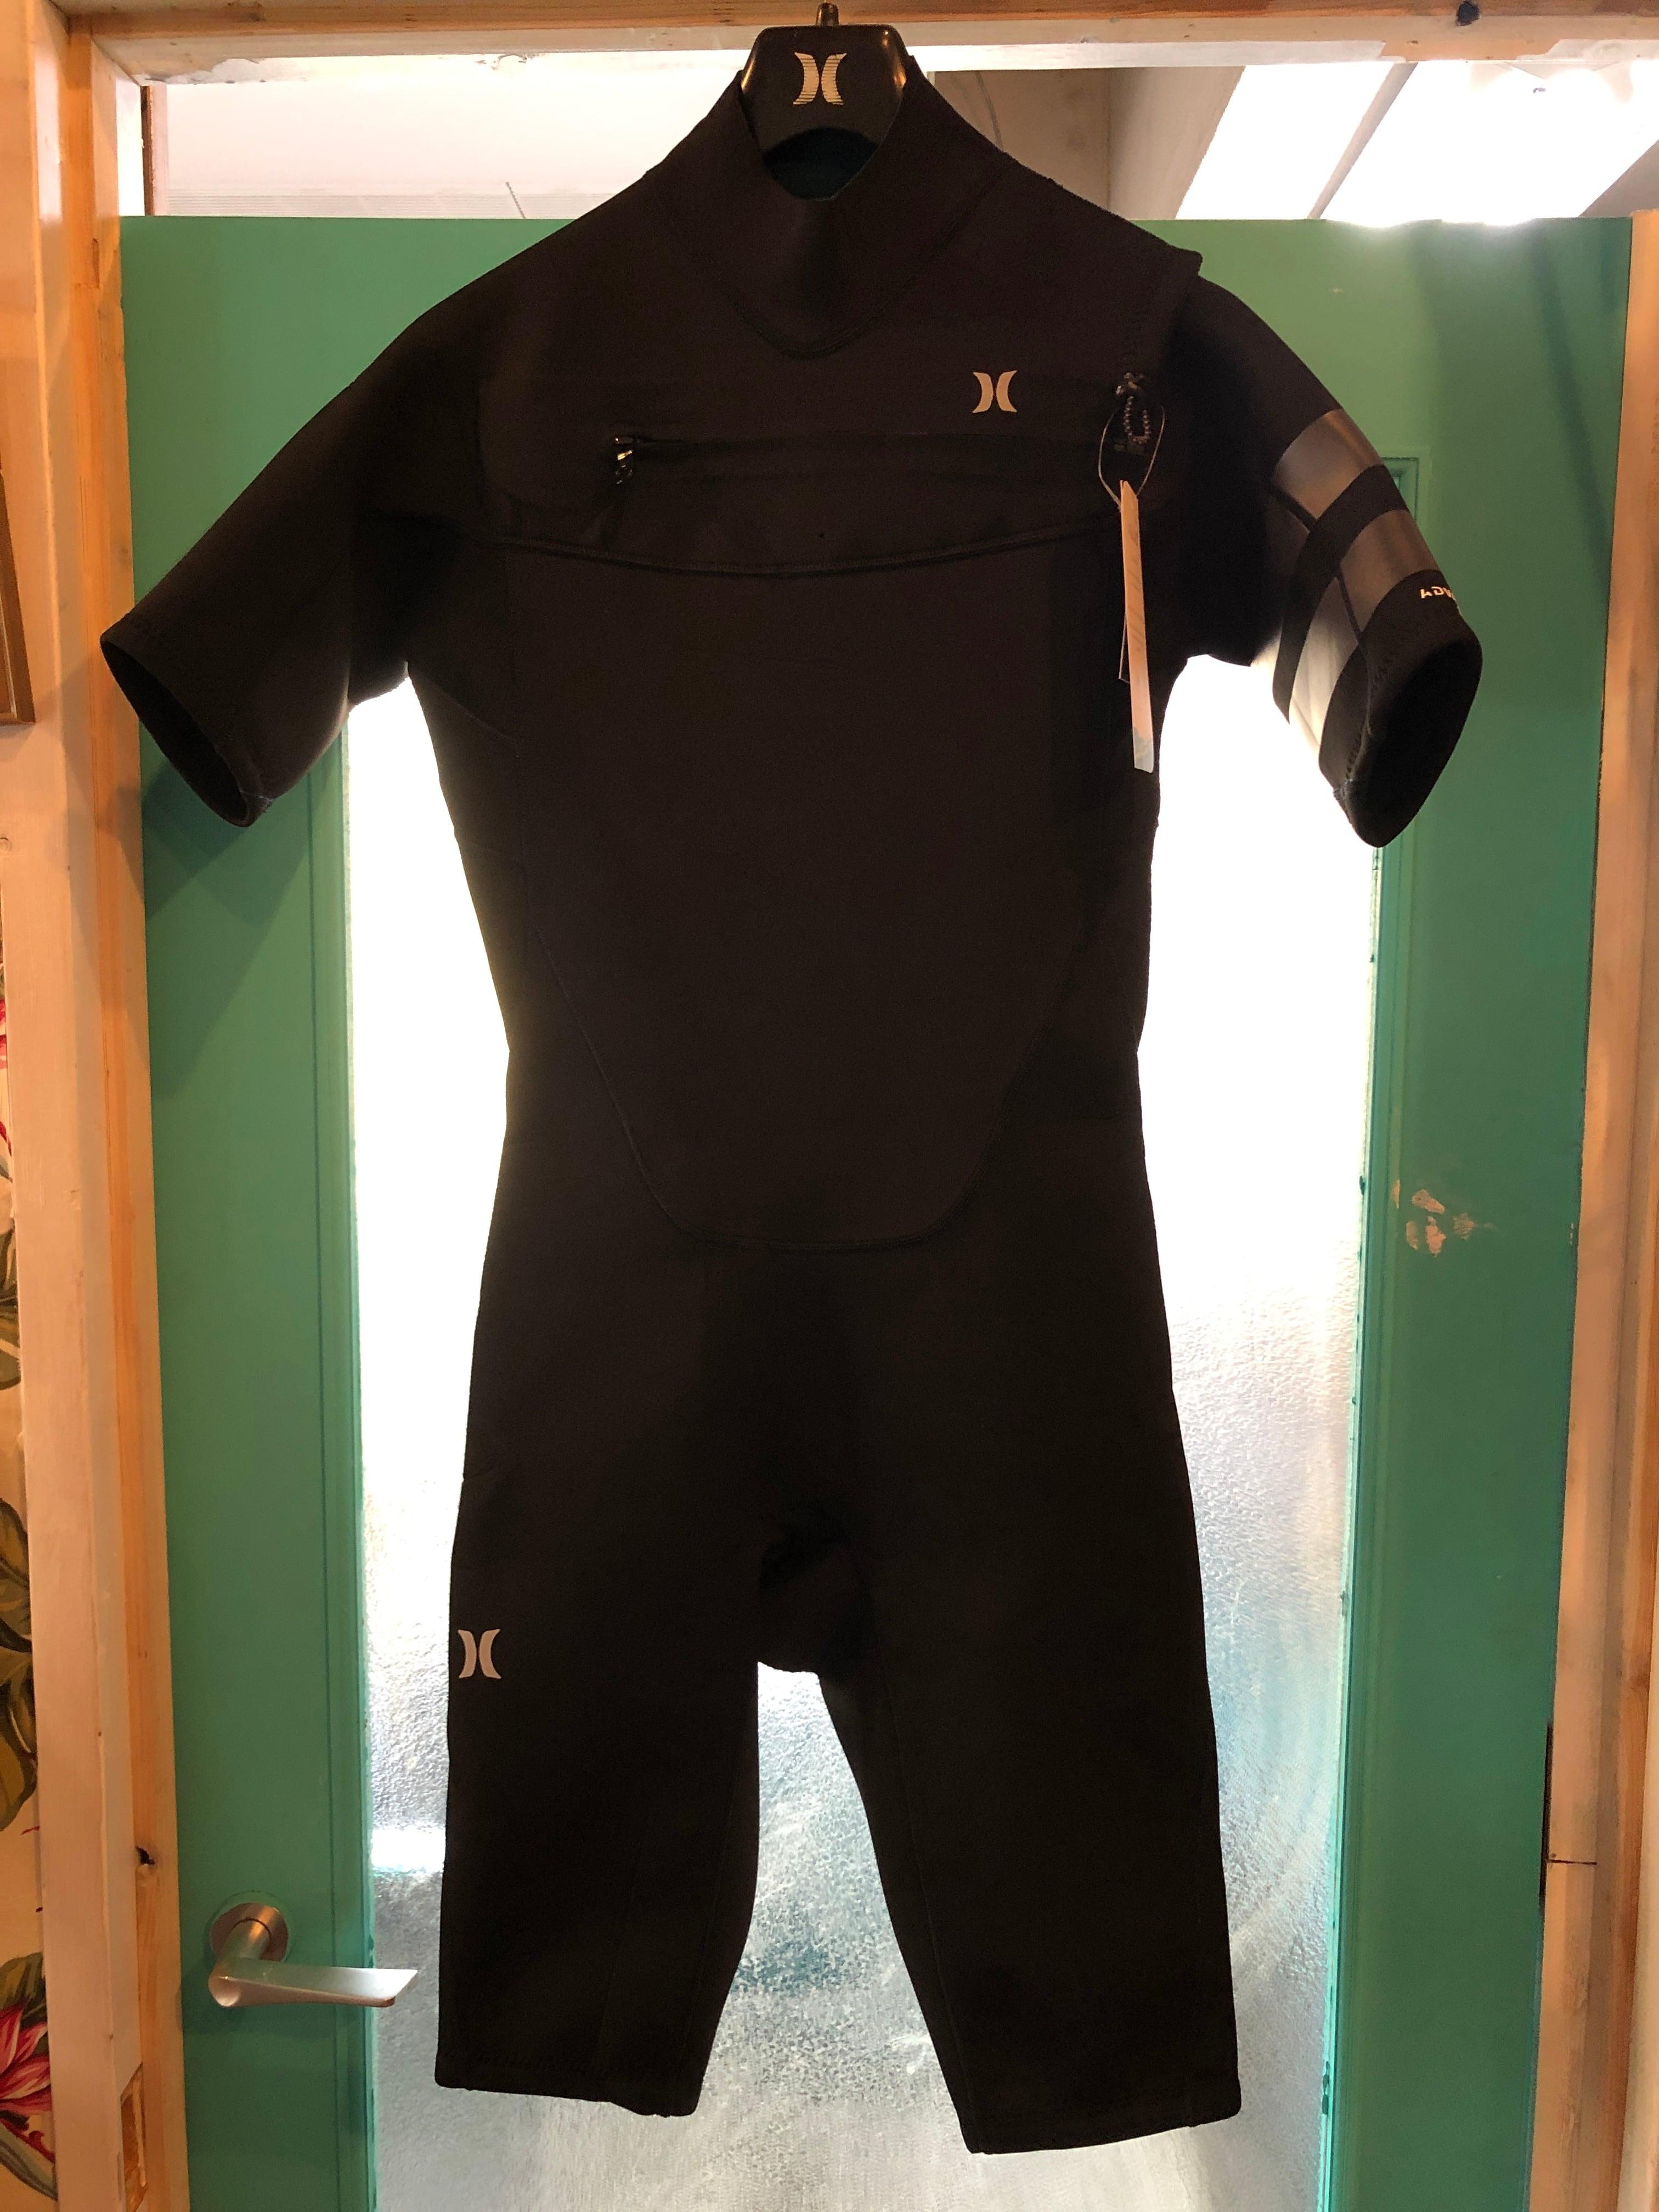 Hurley men's short sleeve spring suit Lサイズ